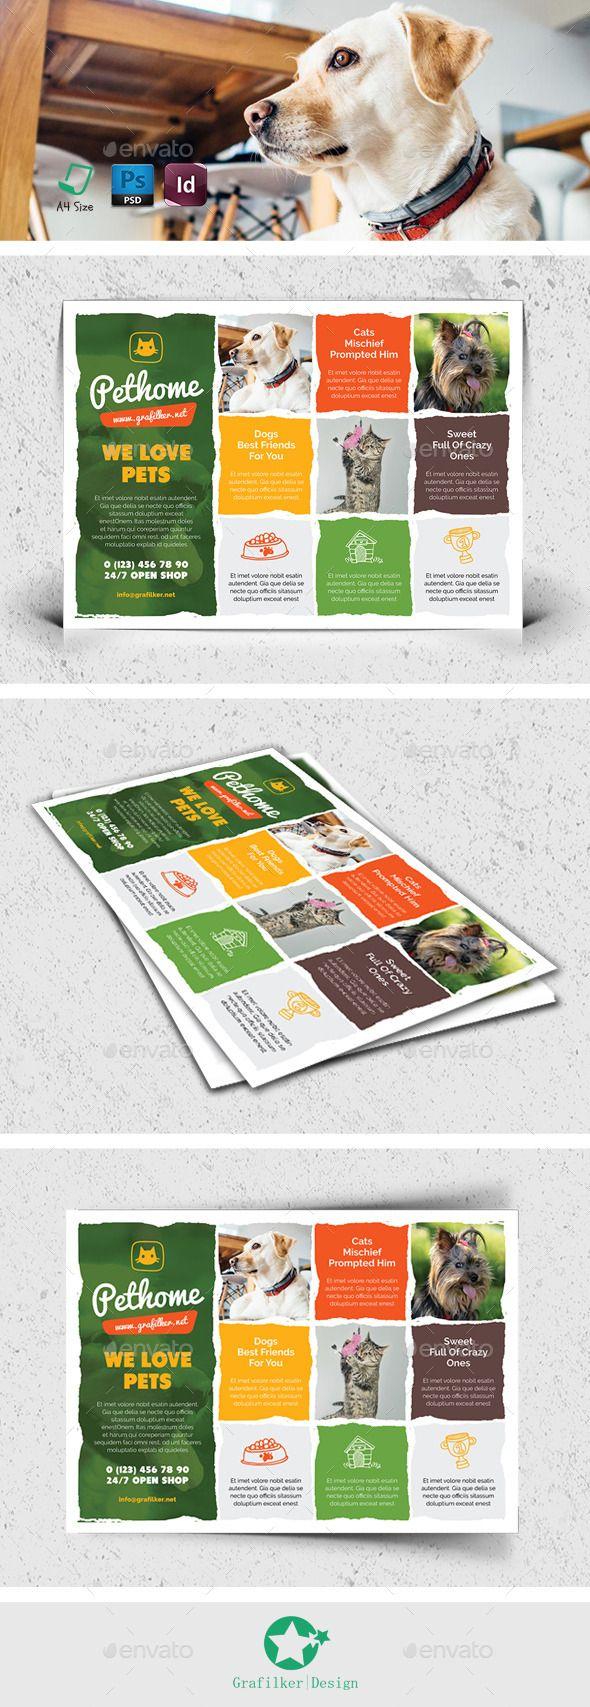 PSD Pet Shop Flyer Templates • Click here to download ! http://graphicriver.net/item/pet-shop-flyer-templates/12740247?ref=pxcr